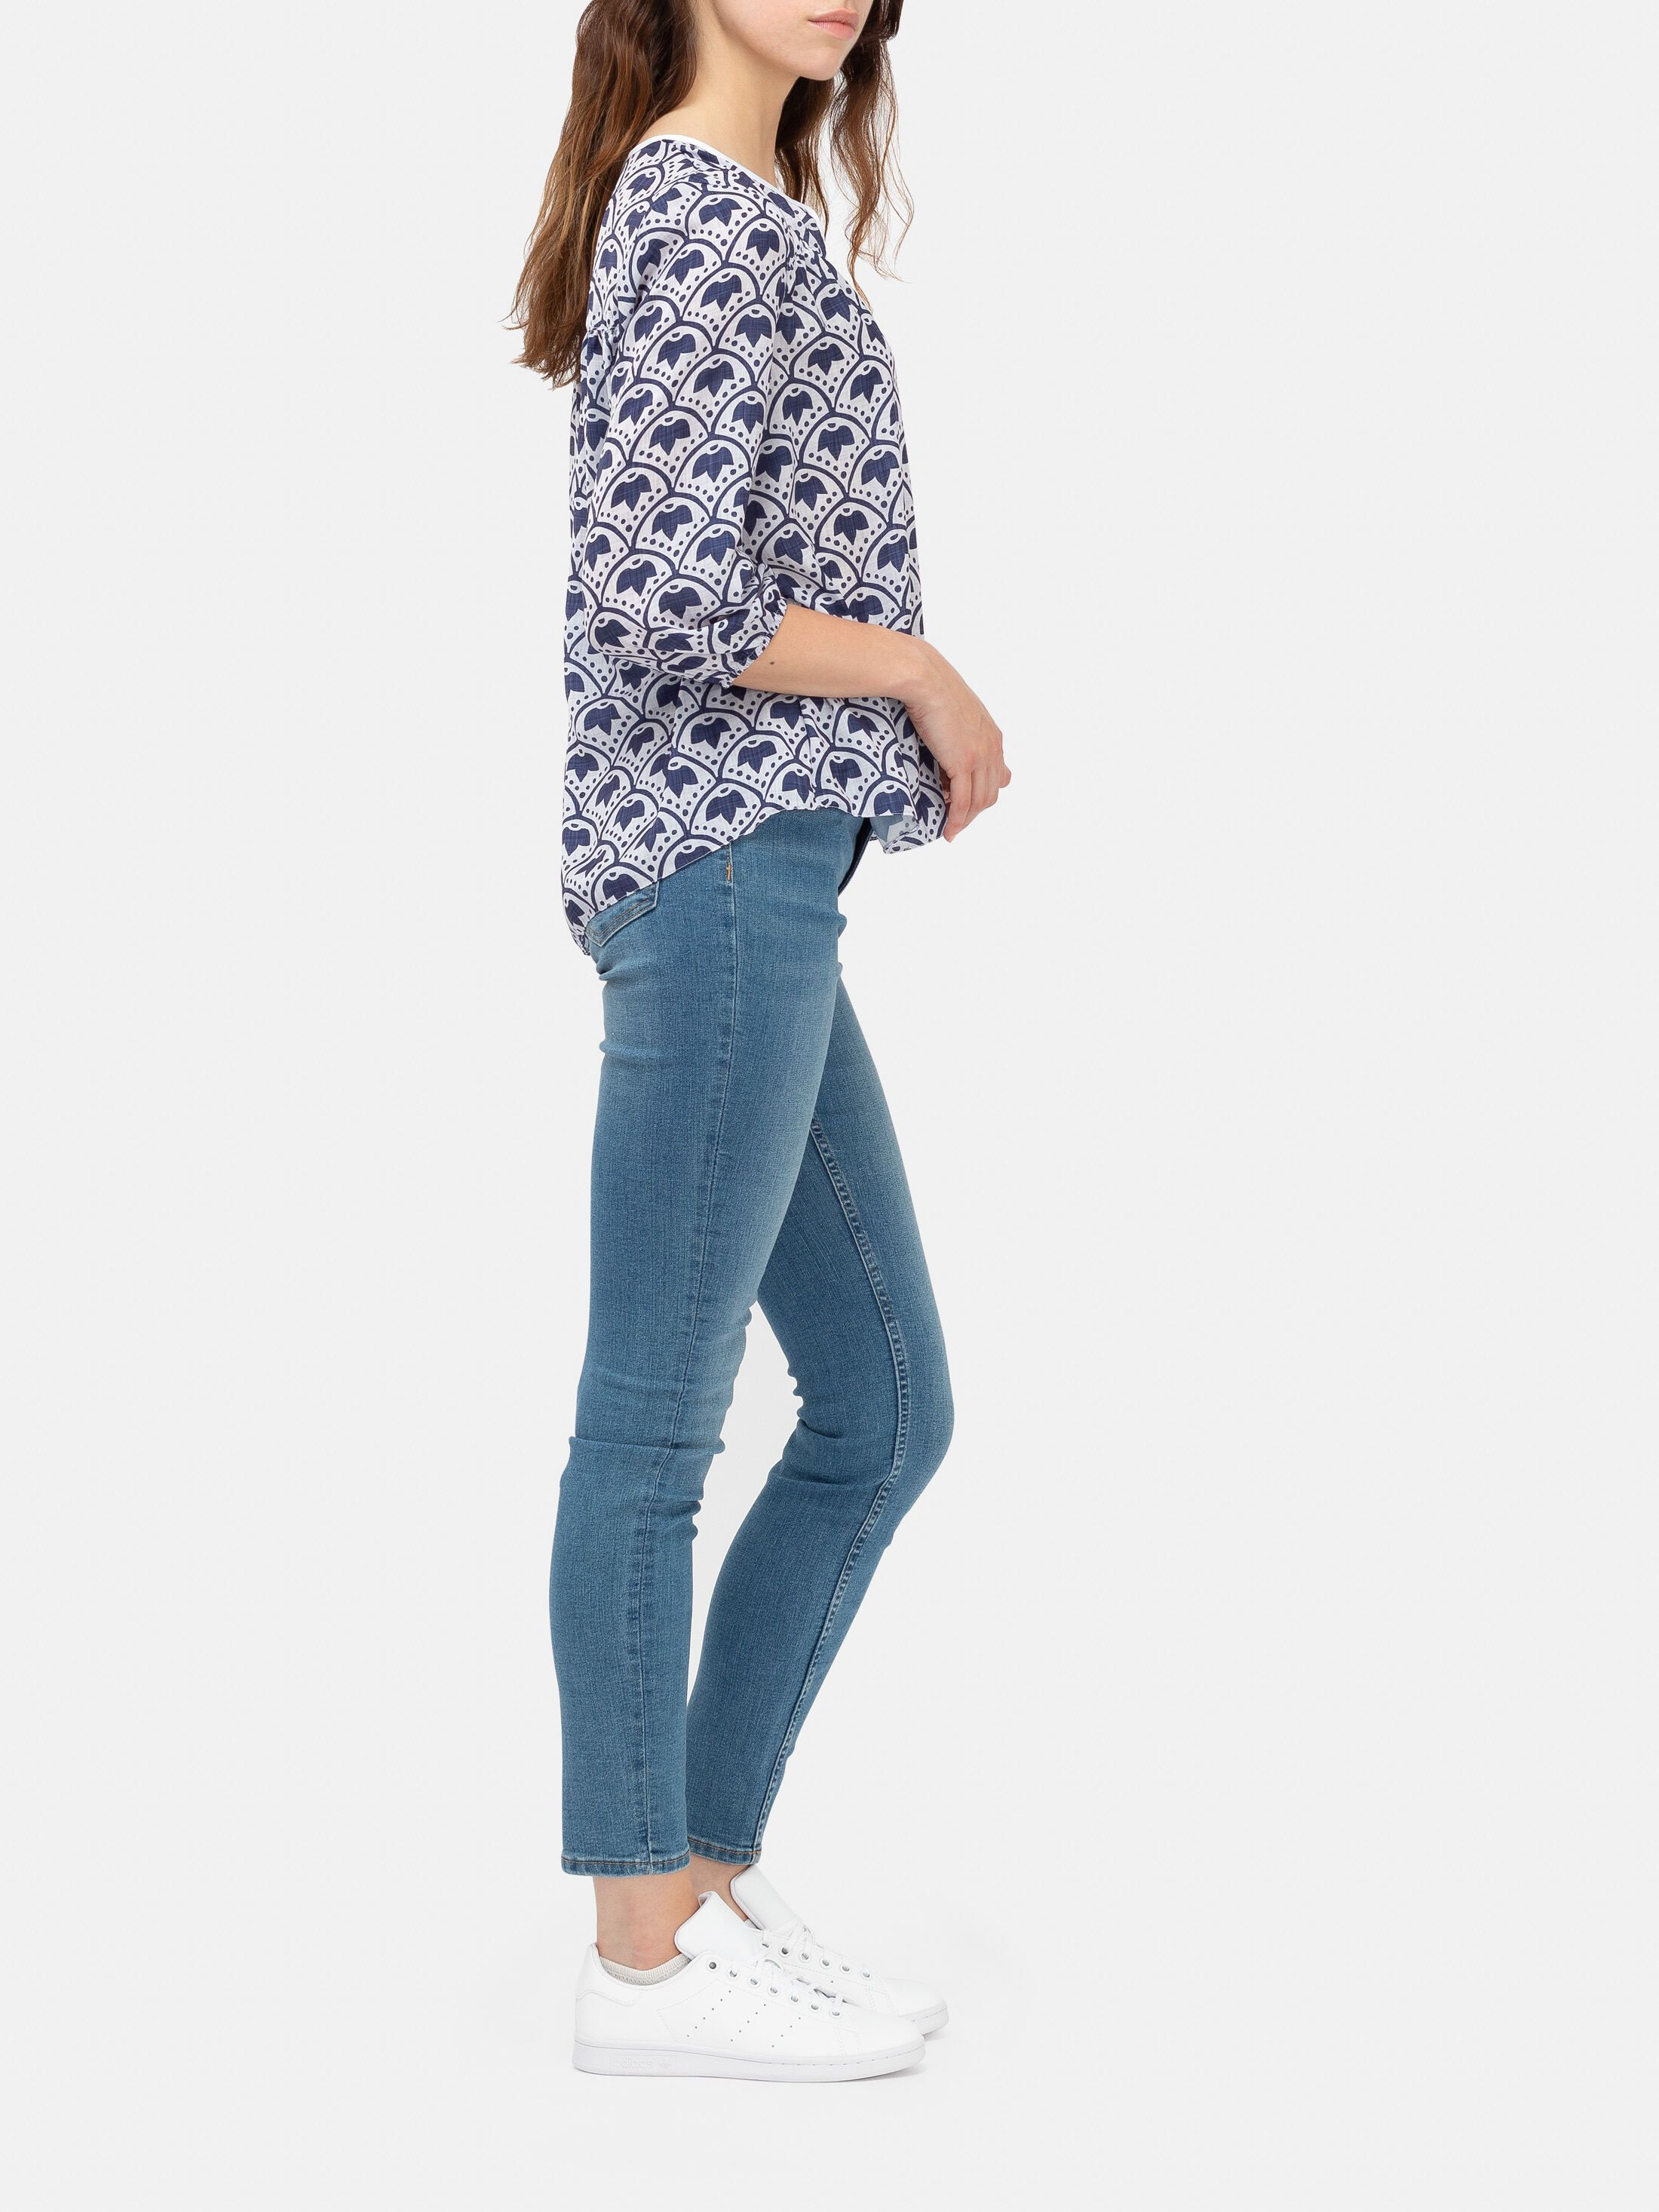 digital print blouse